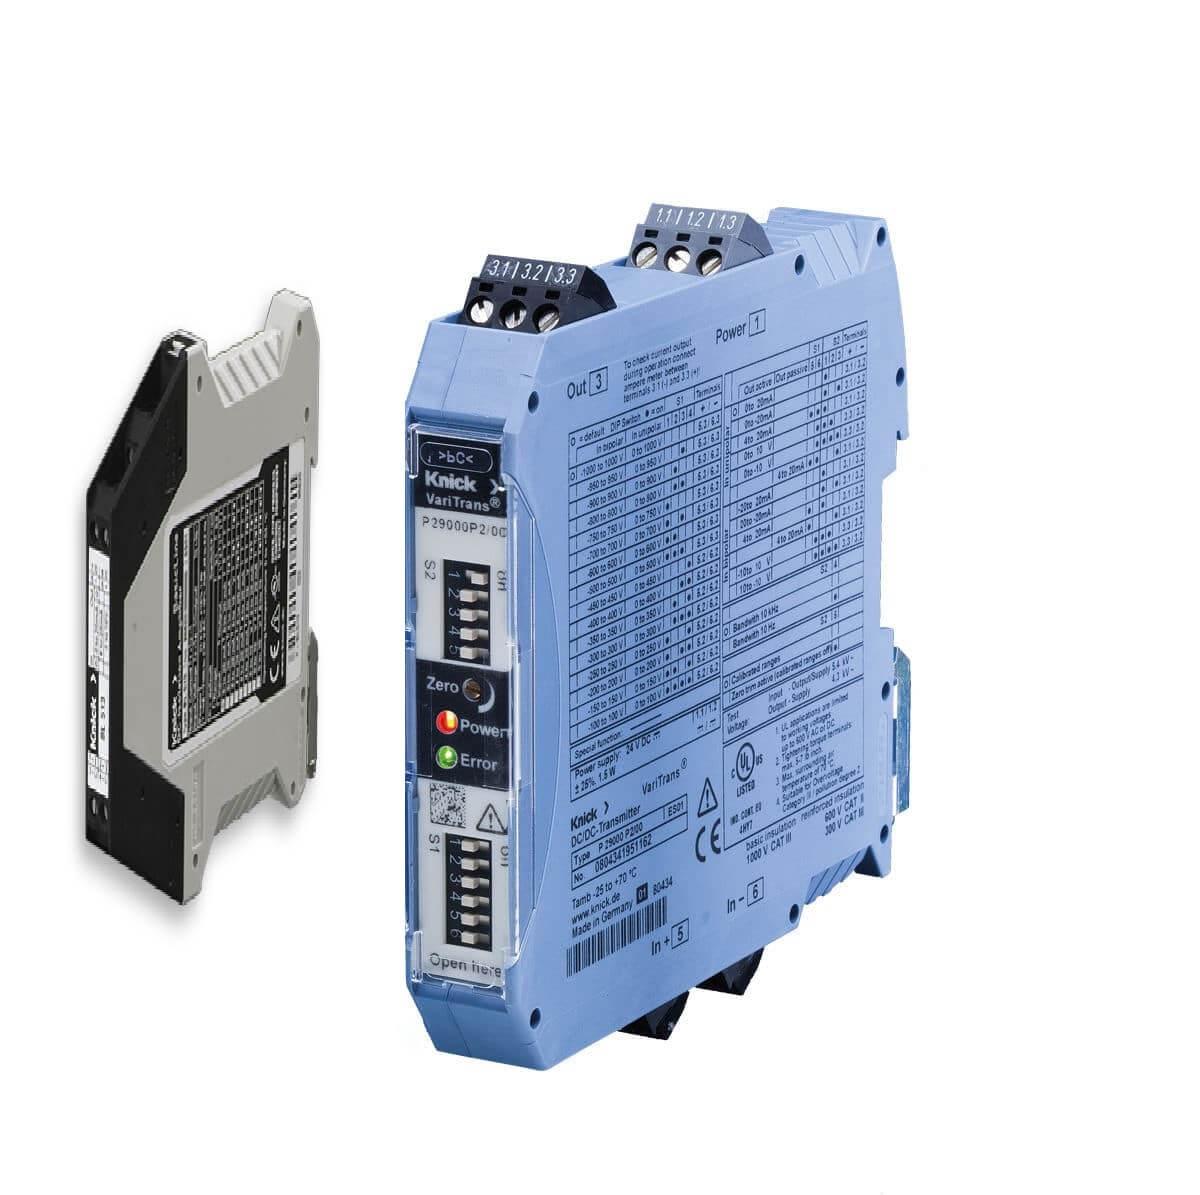 Loop-Powered Signal Isolator